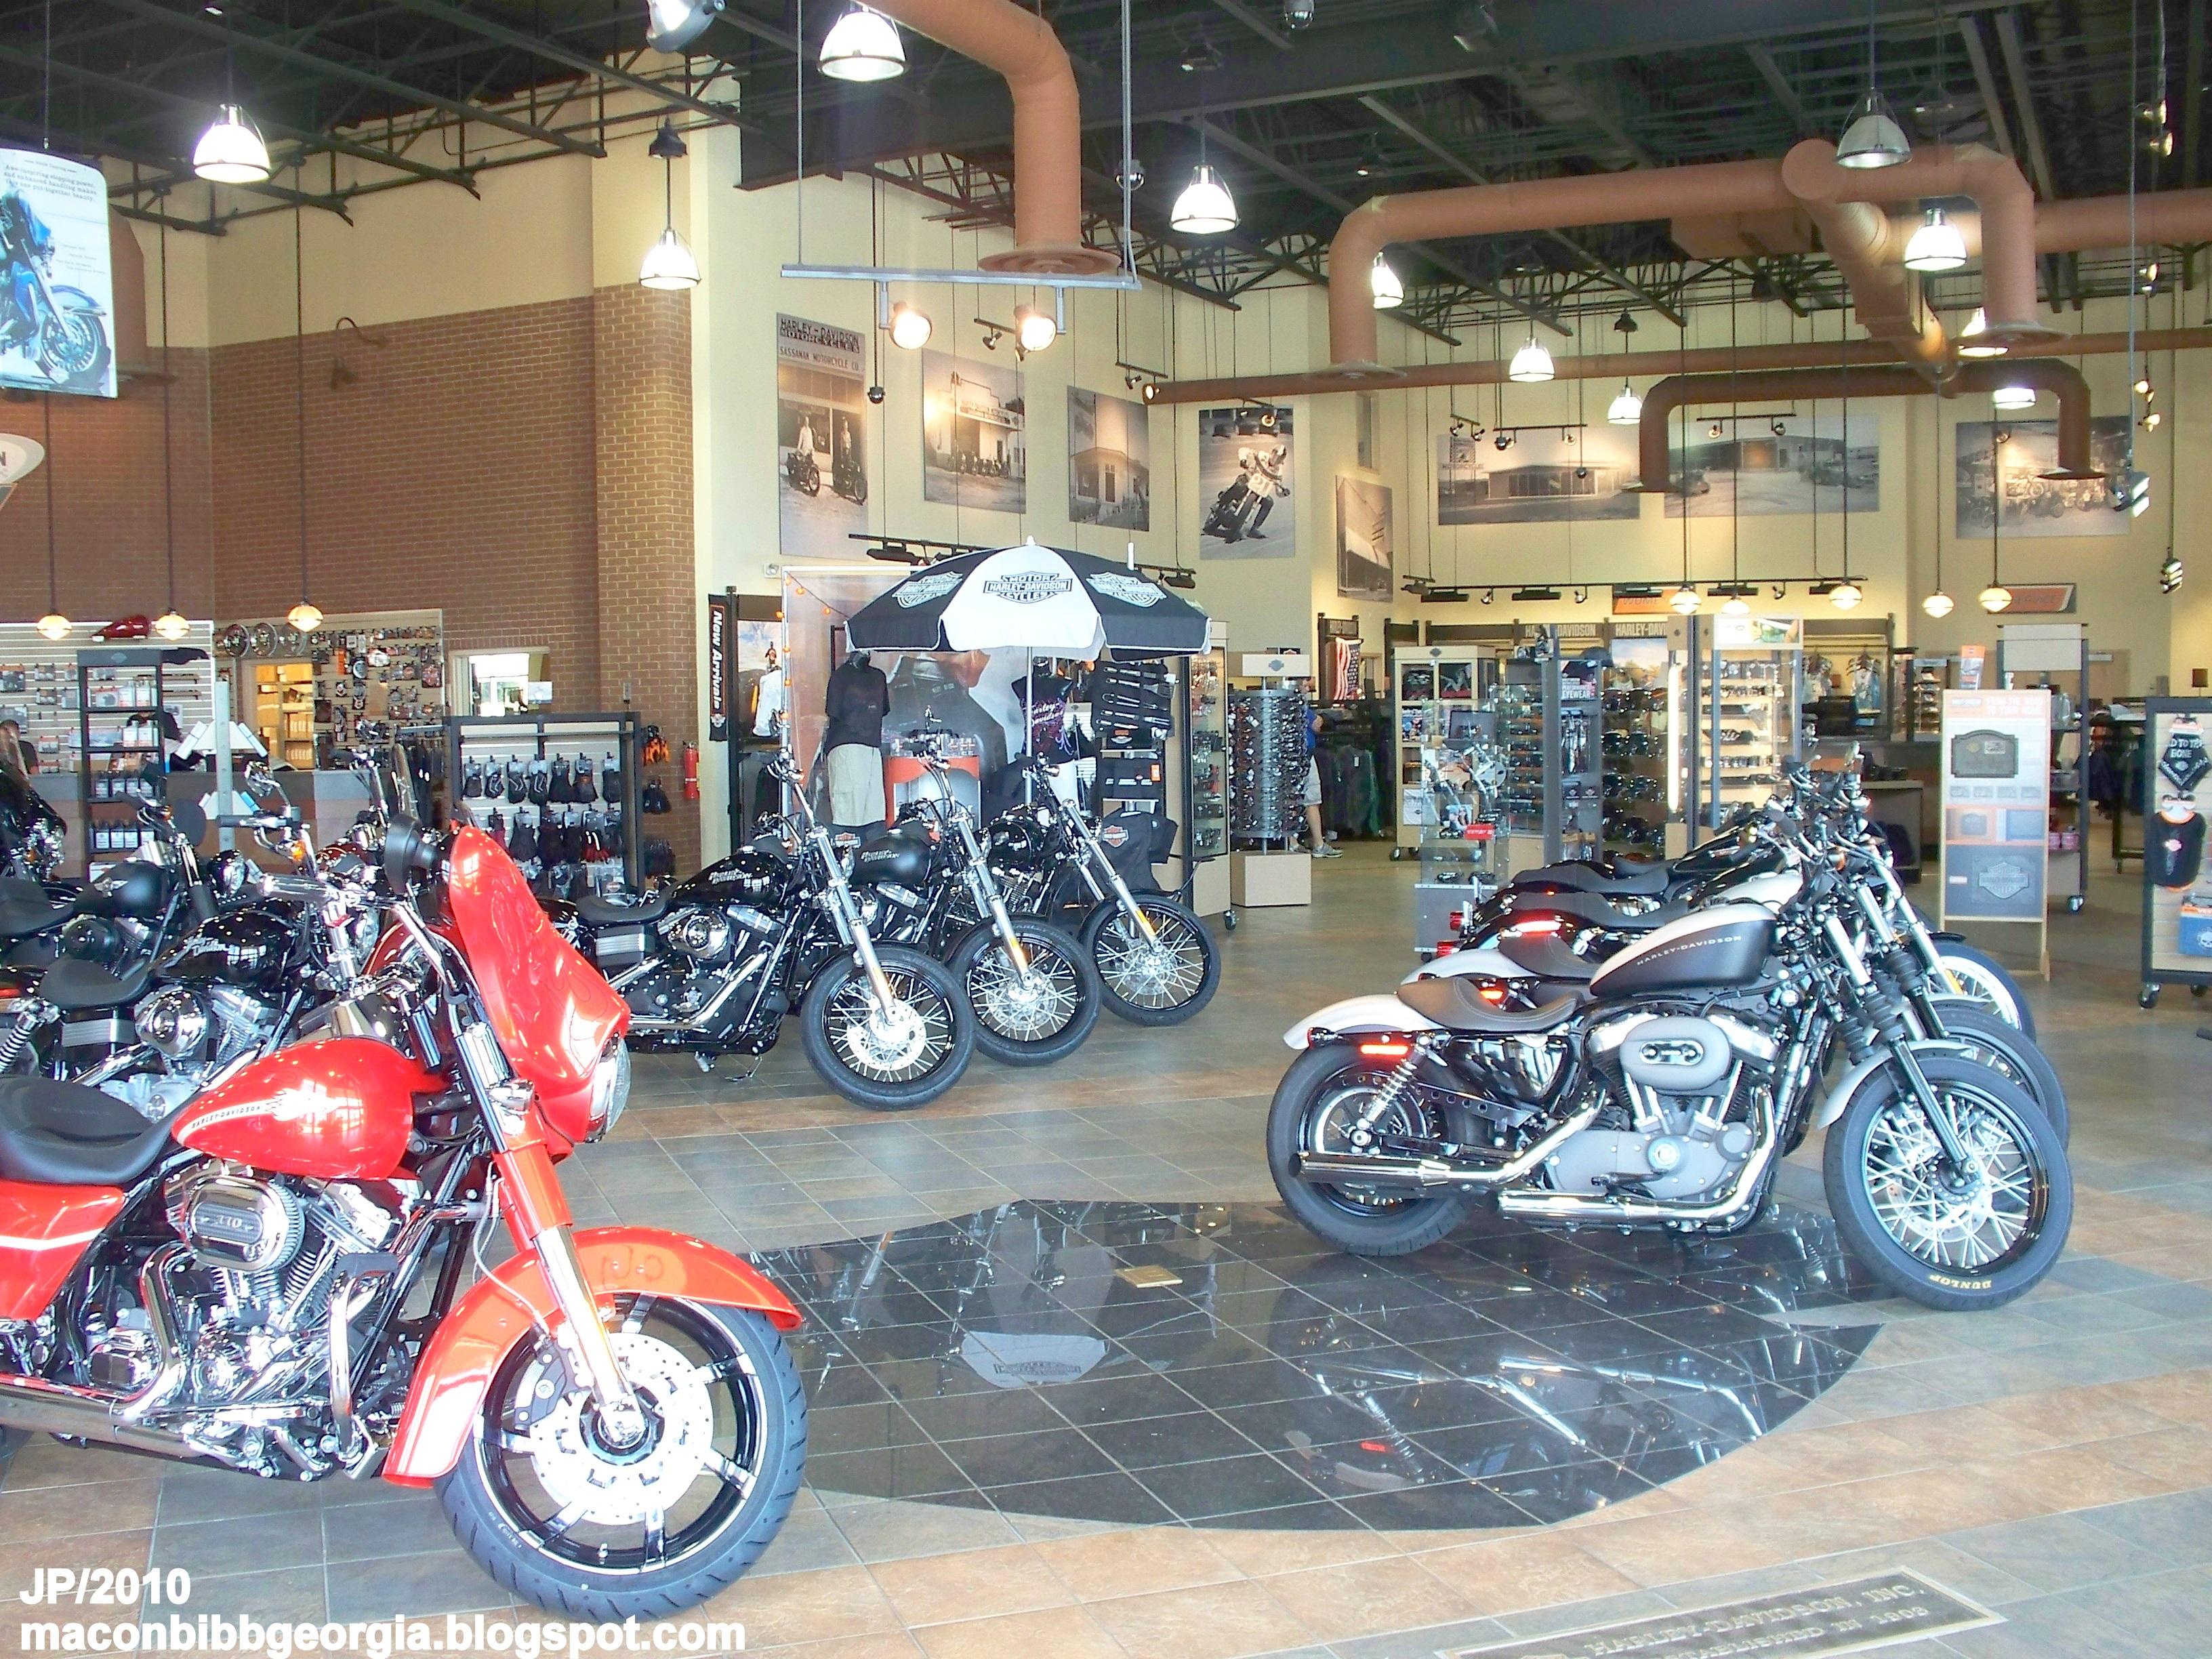 Georgia harley harley davidson motorcycle dealer html for Yamaha motorcycle dealership